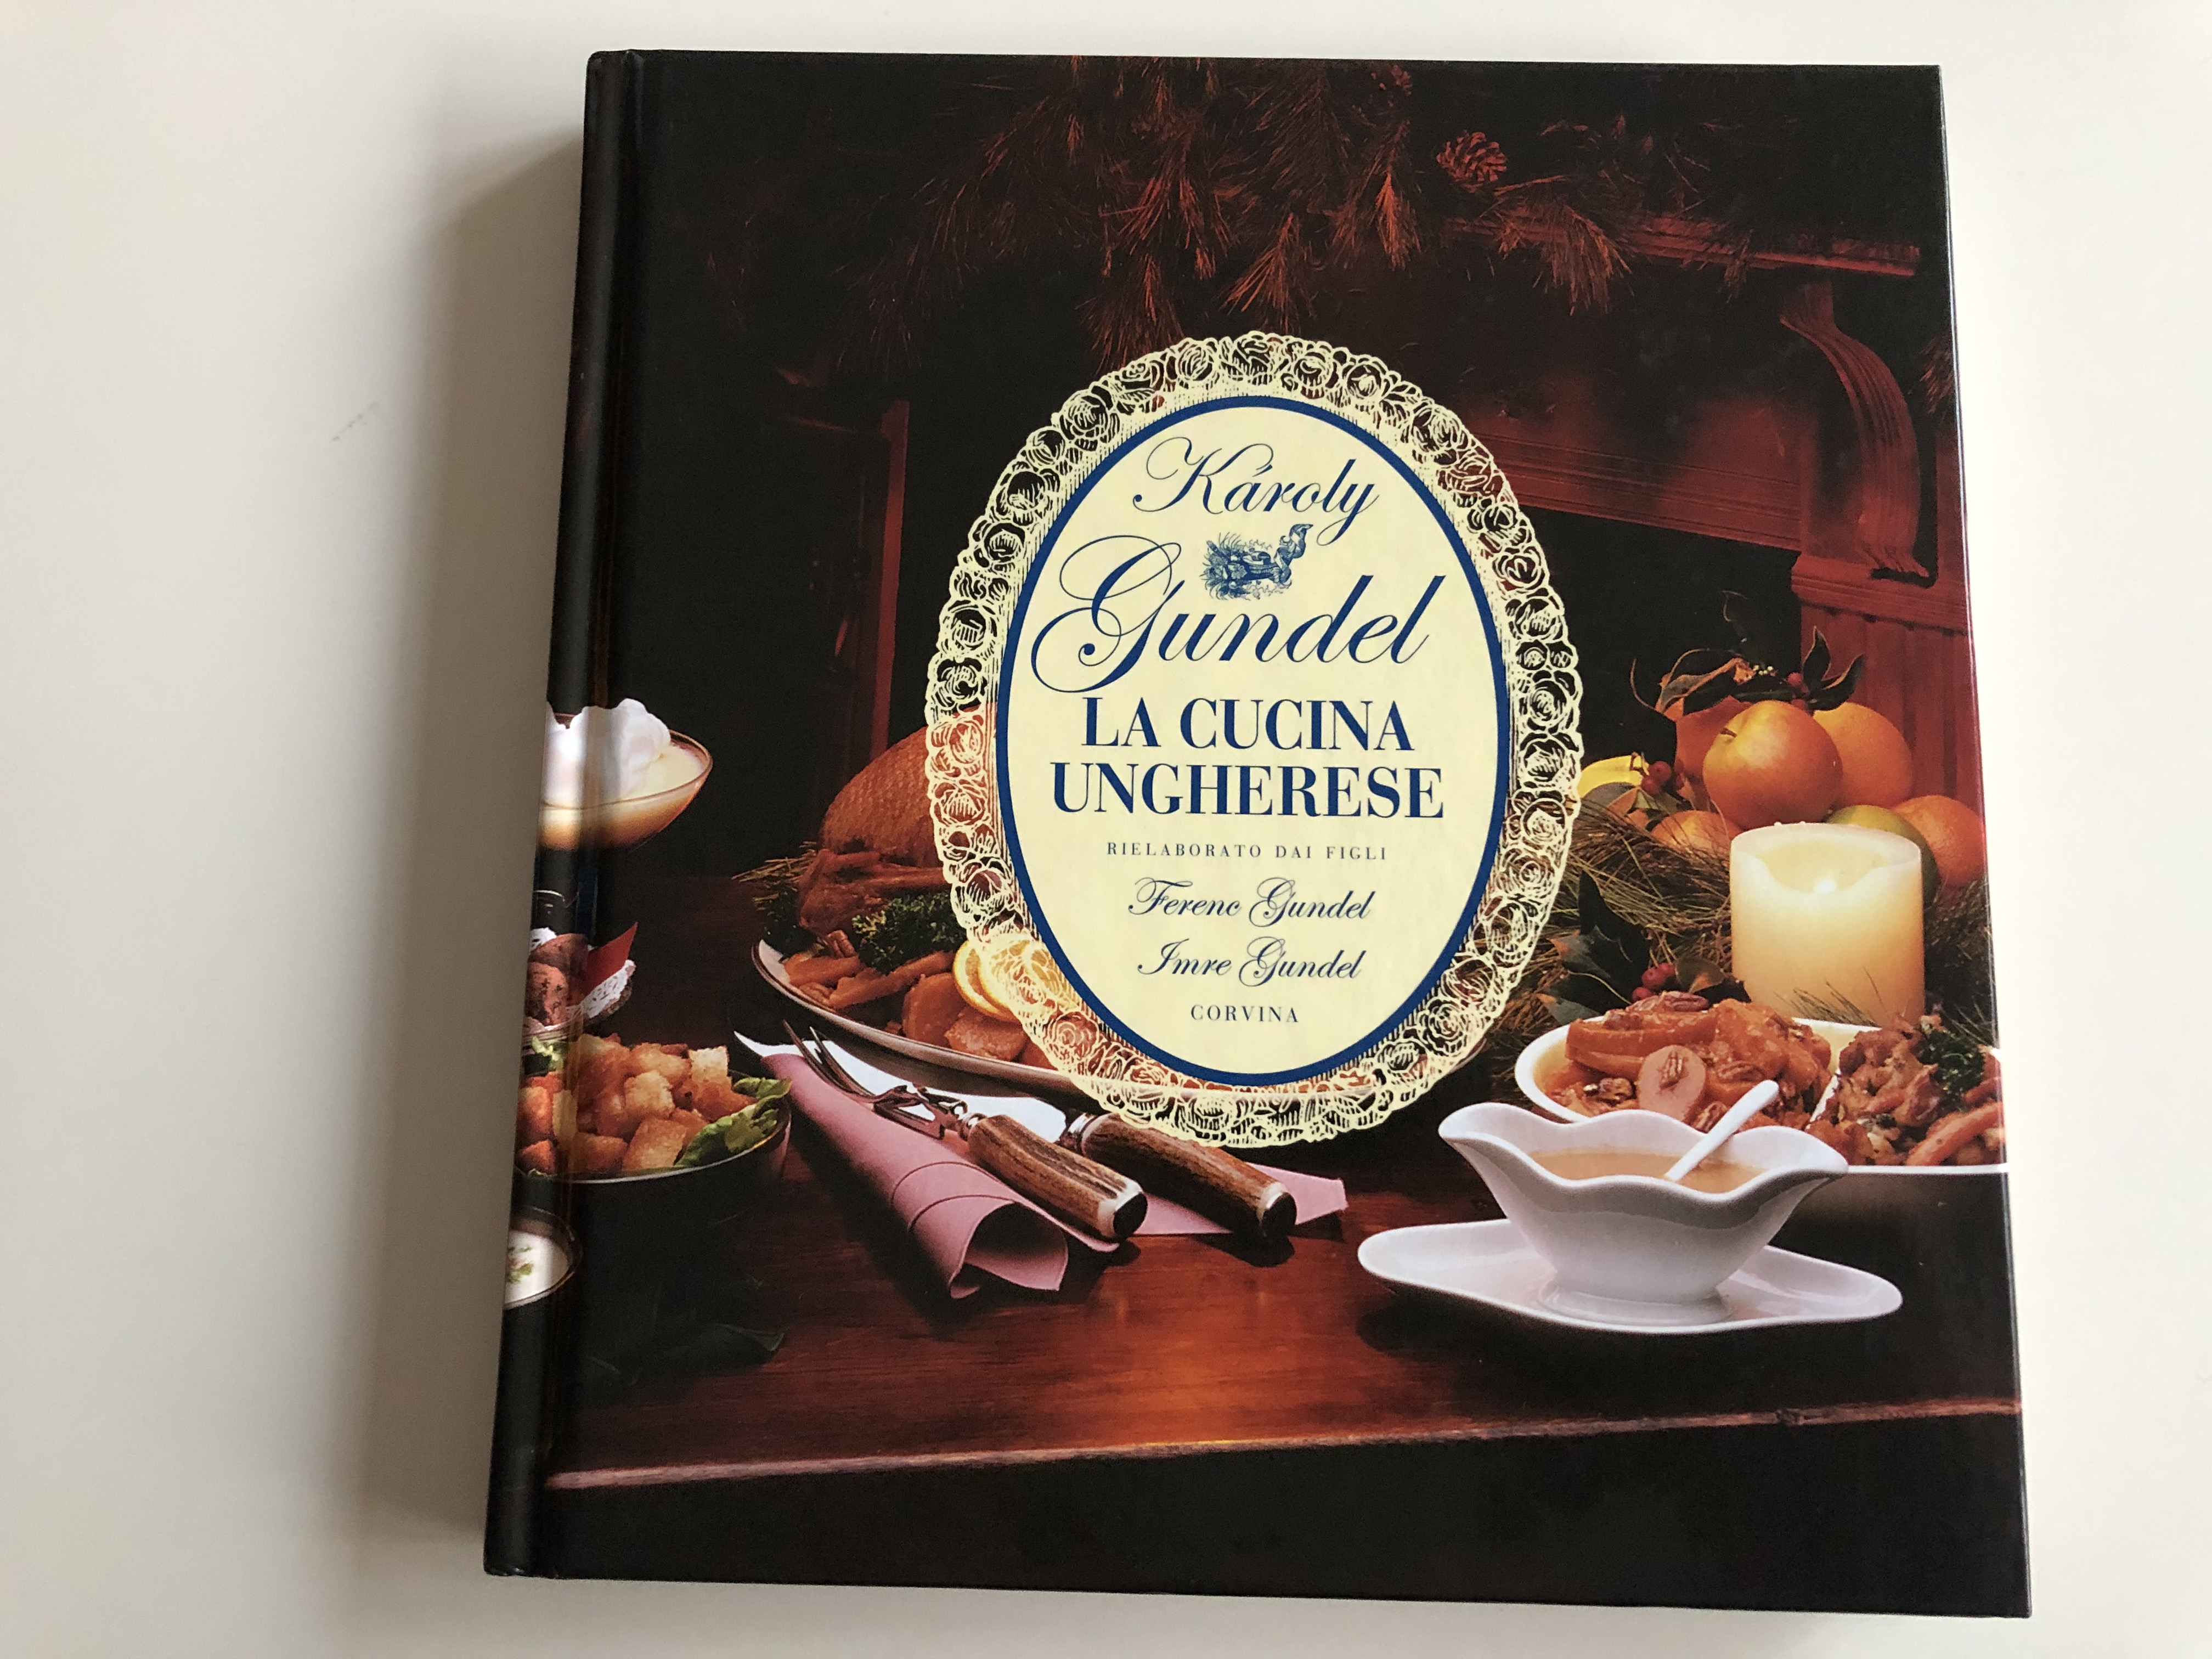 la-cucina-ungherese-by-k-roly-gundel-rielaborat-dai-figli-ferenc-gundel-imre-gundel-corvina-1.jpg